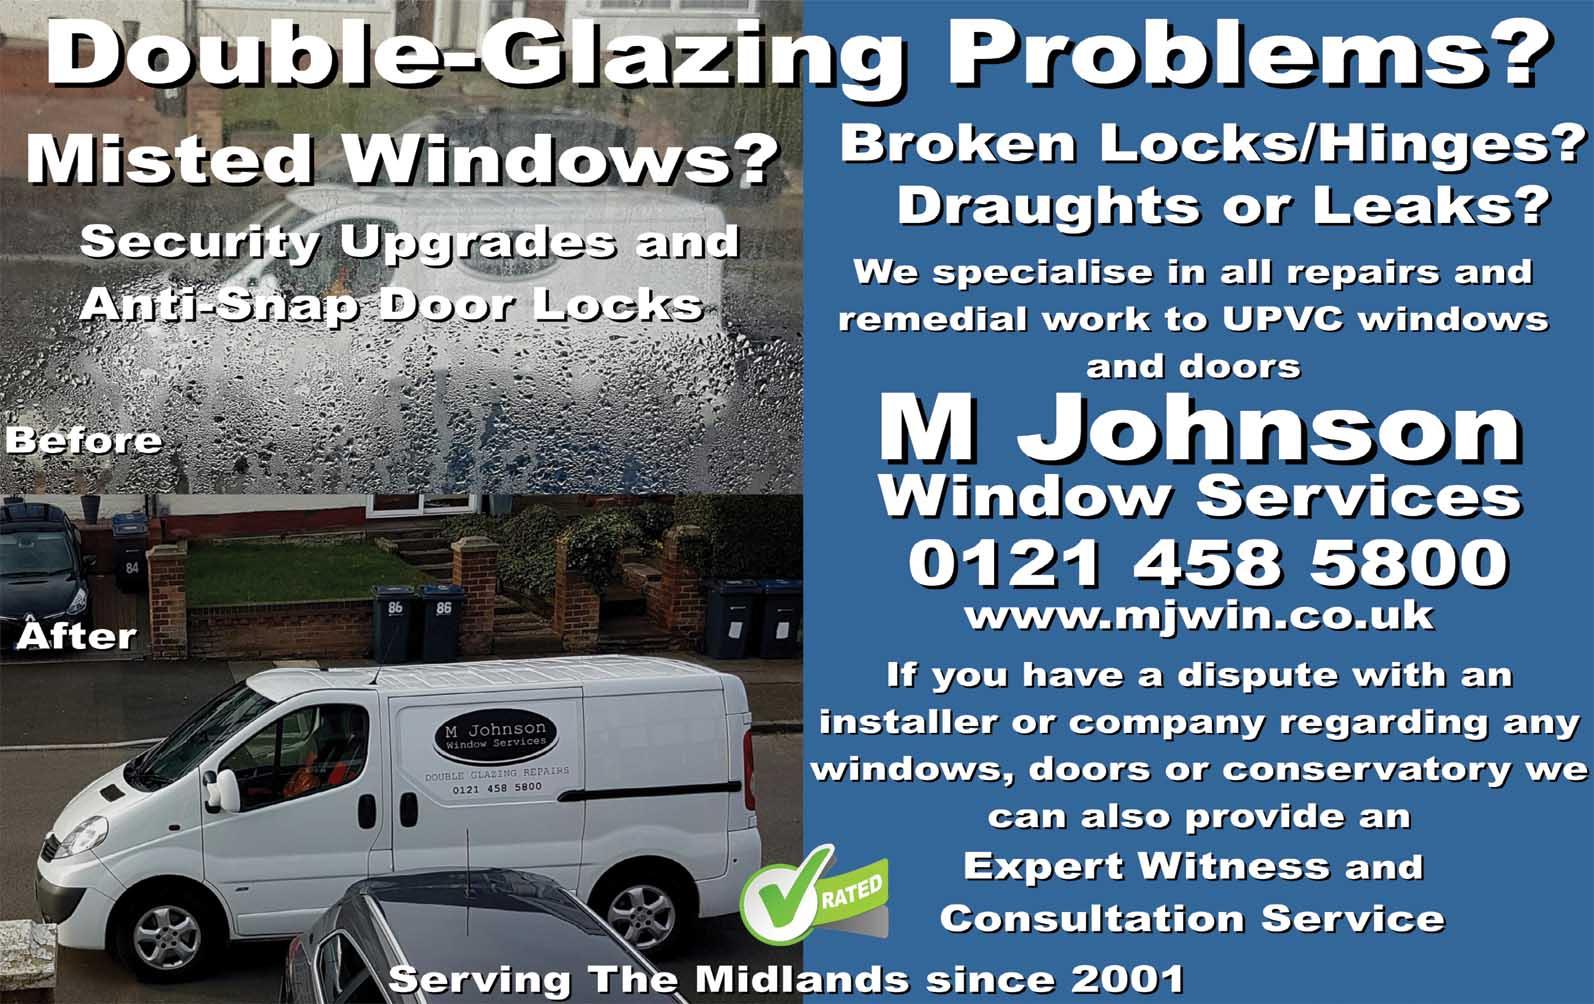 https://0201.nccdn.net/1_2/000/000/120/b0f/m-johnson-window-services-hp-1594x1004.jpg